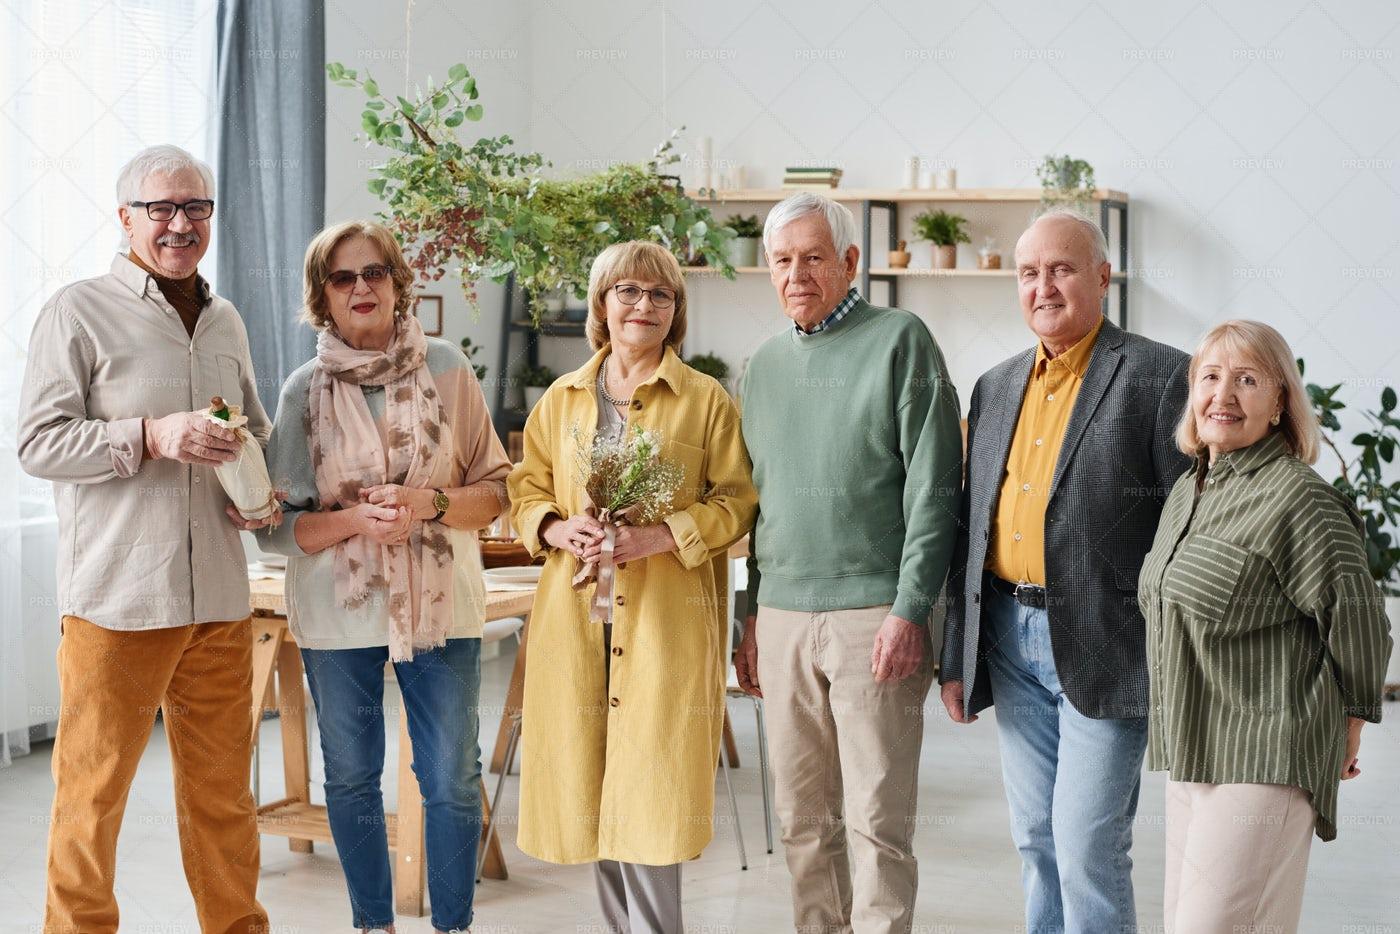 Portrait Of Senior People: Stock Photos